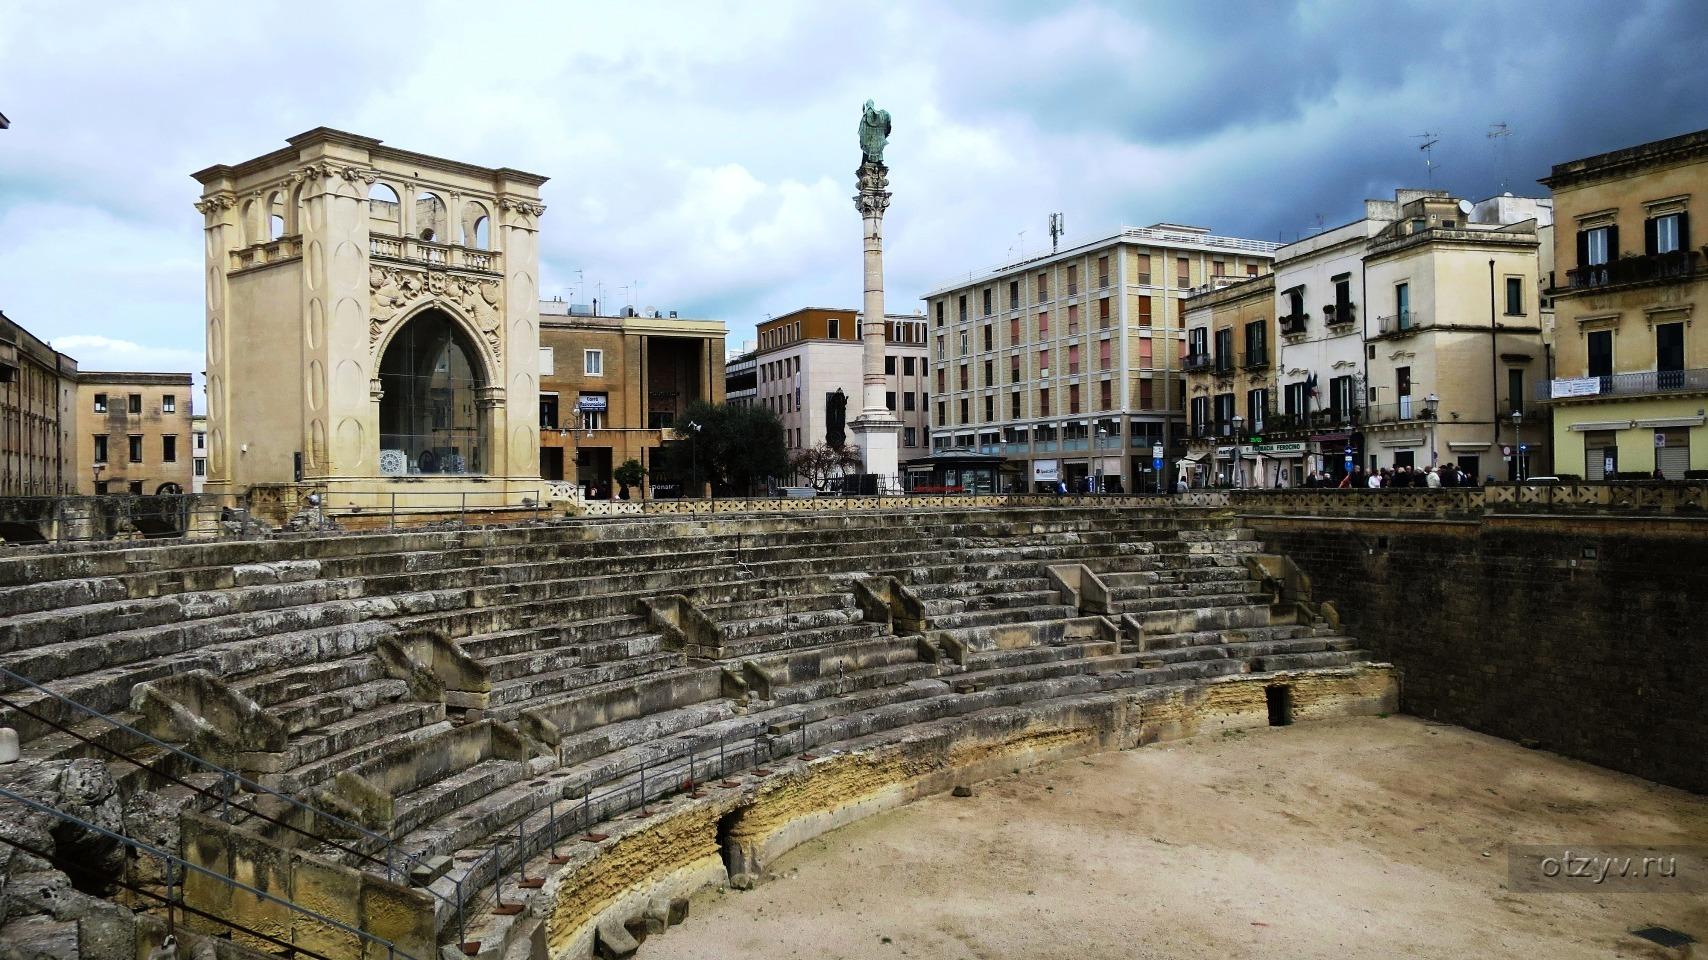 масла, попадающие италия город лече фото пряники